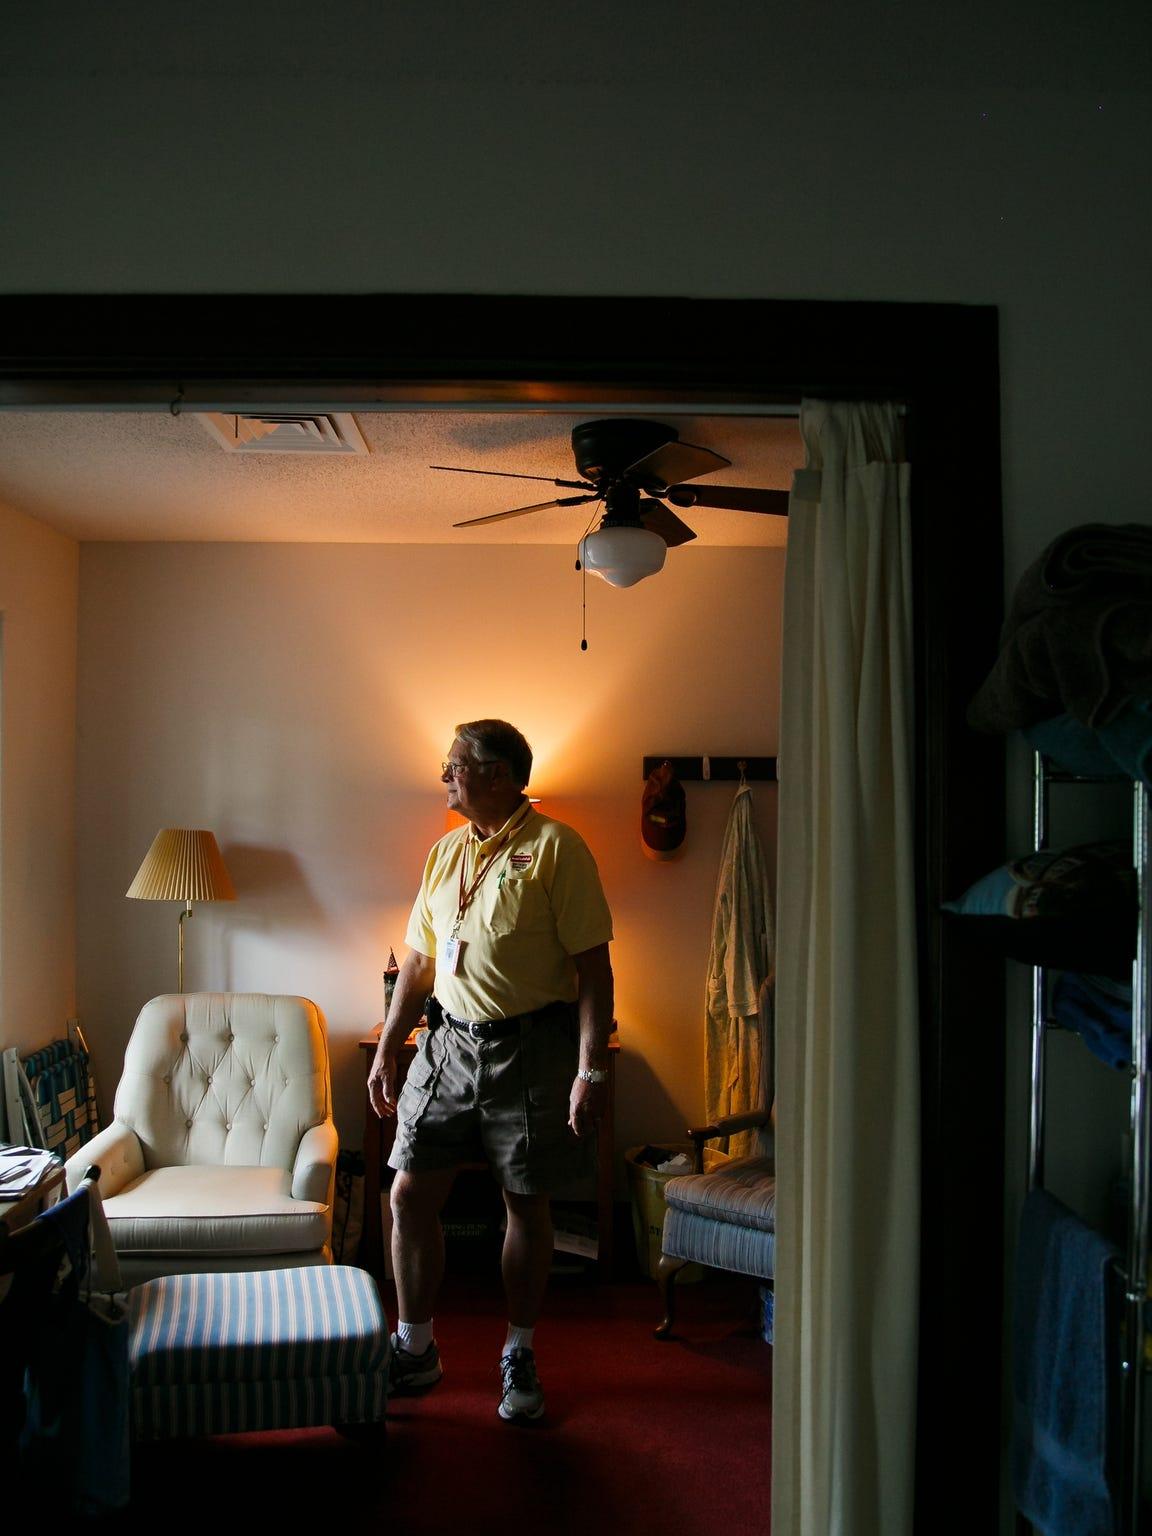 Iowa State Fair Board member Jerry Parkin stands inside